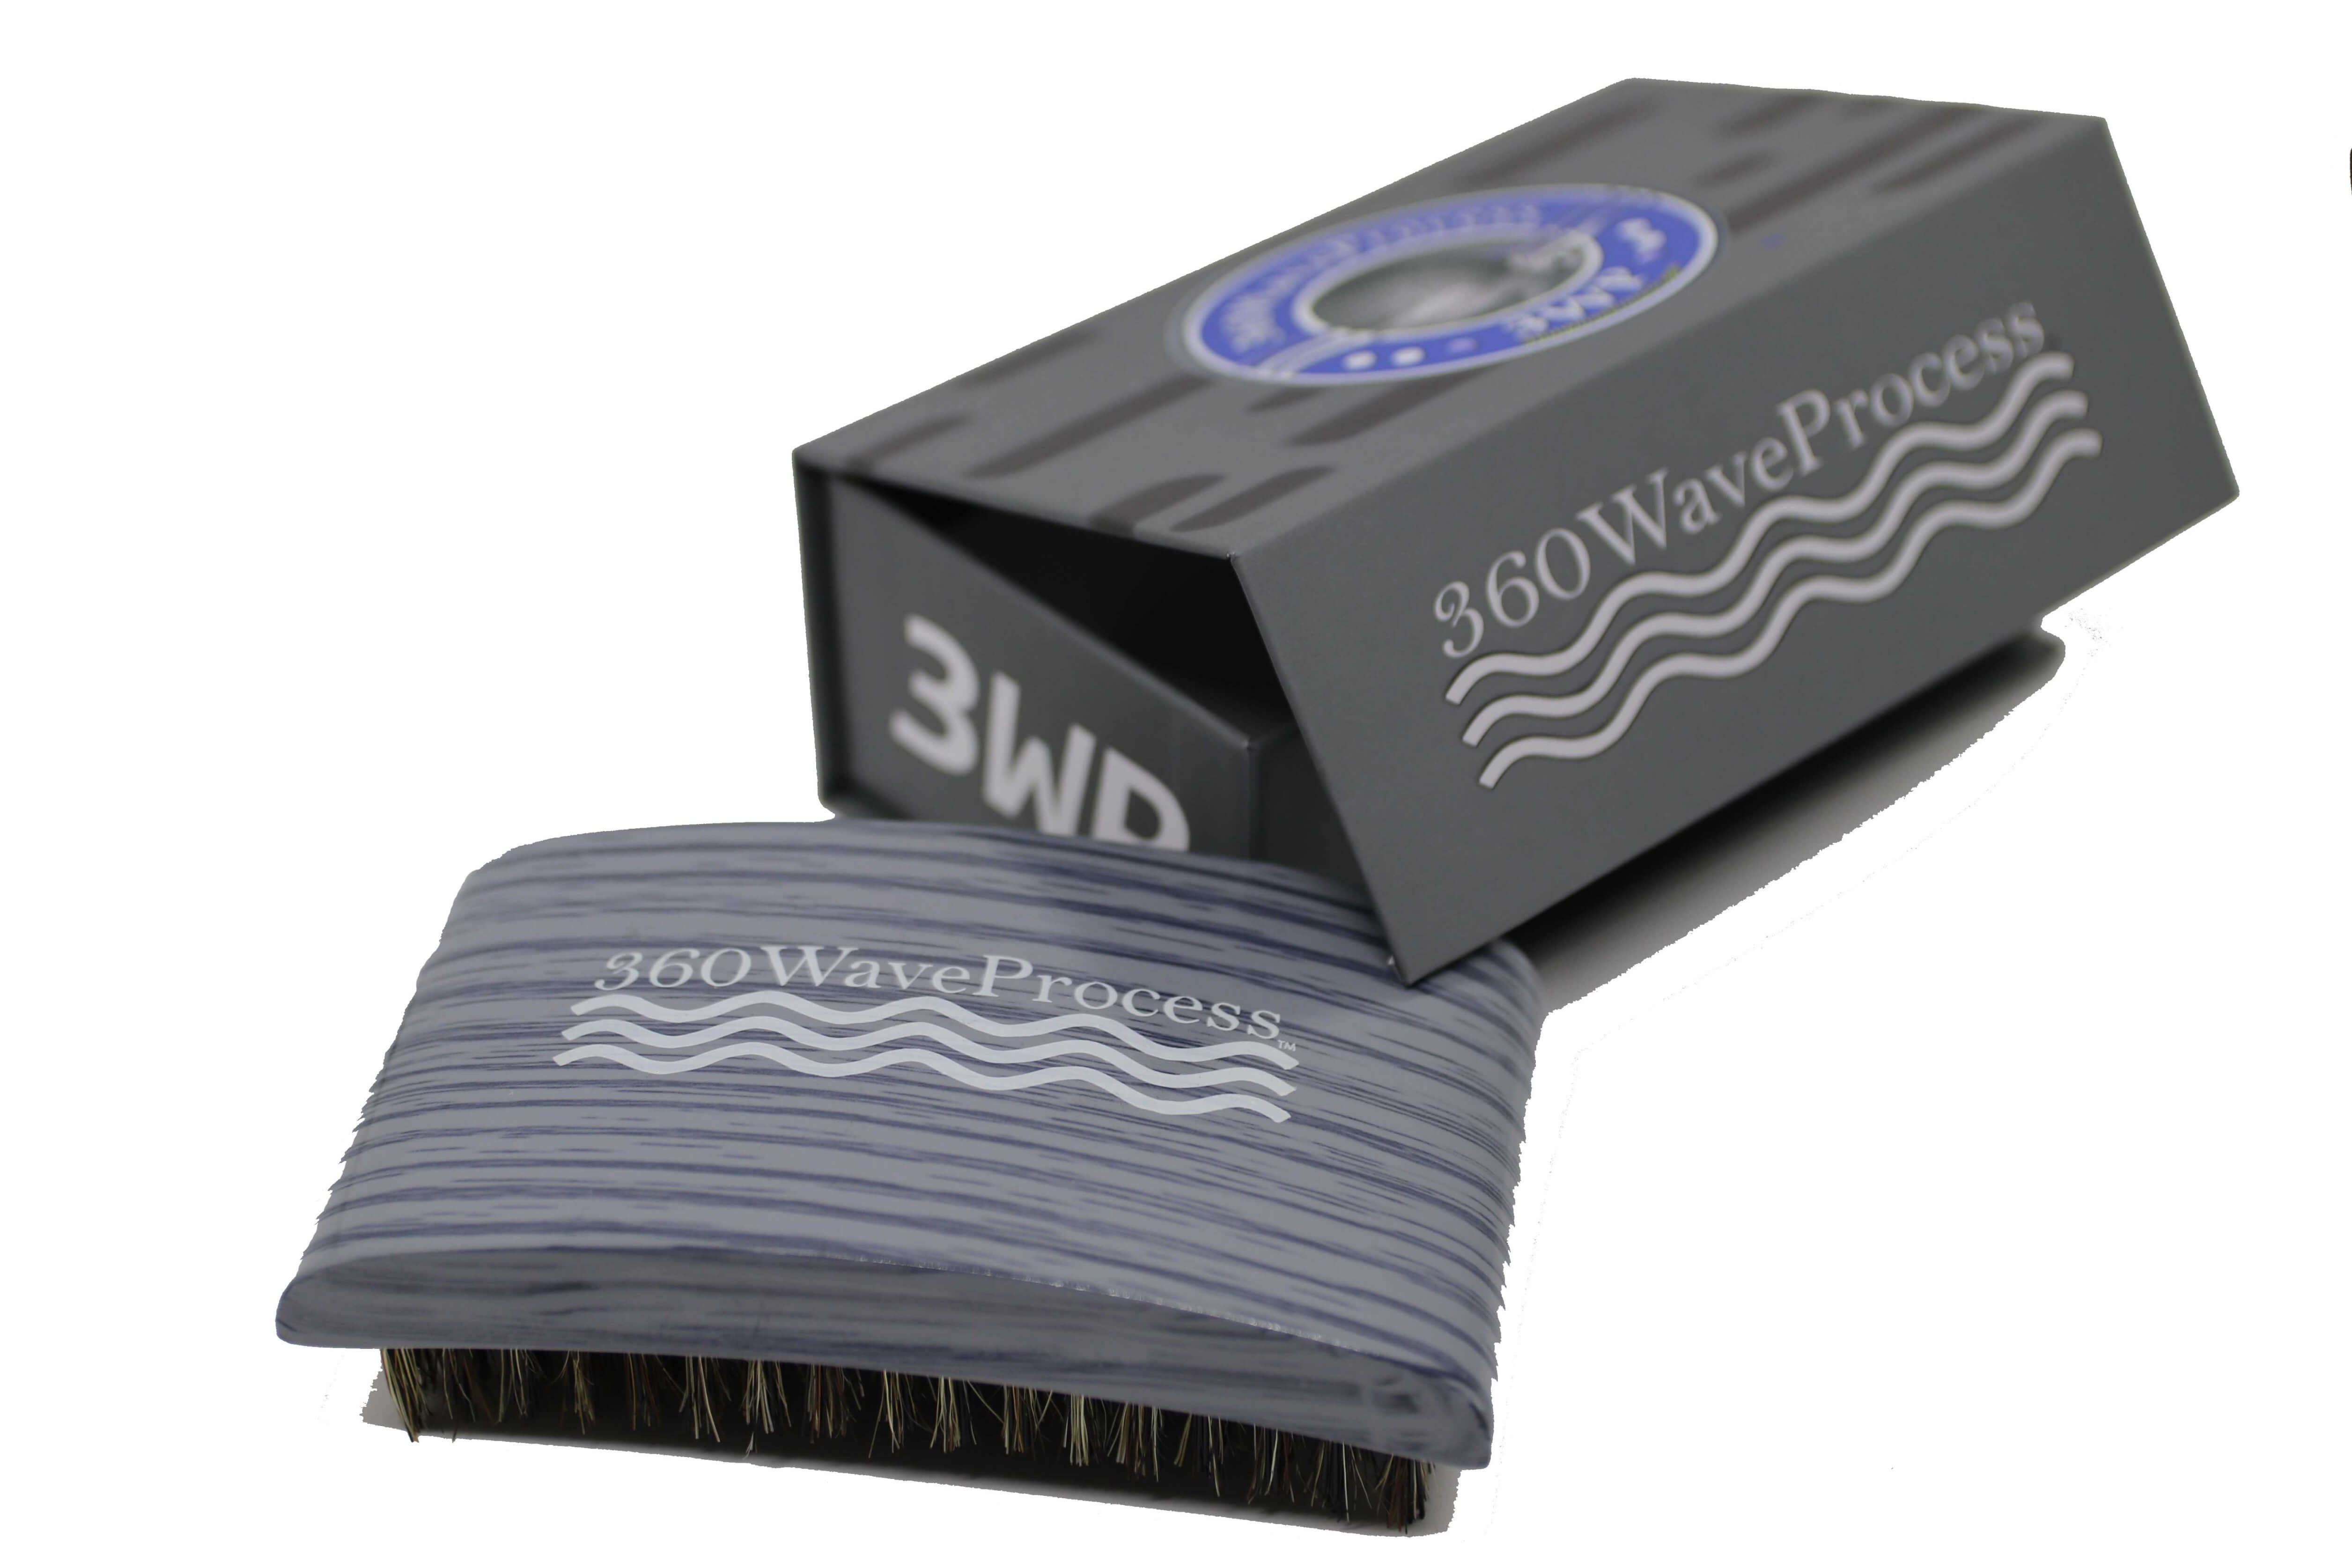 3WP s line Curved gloss Grey 360 Wave Fork Breaker Brush